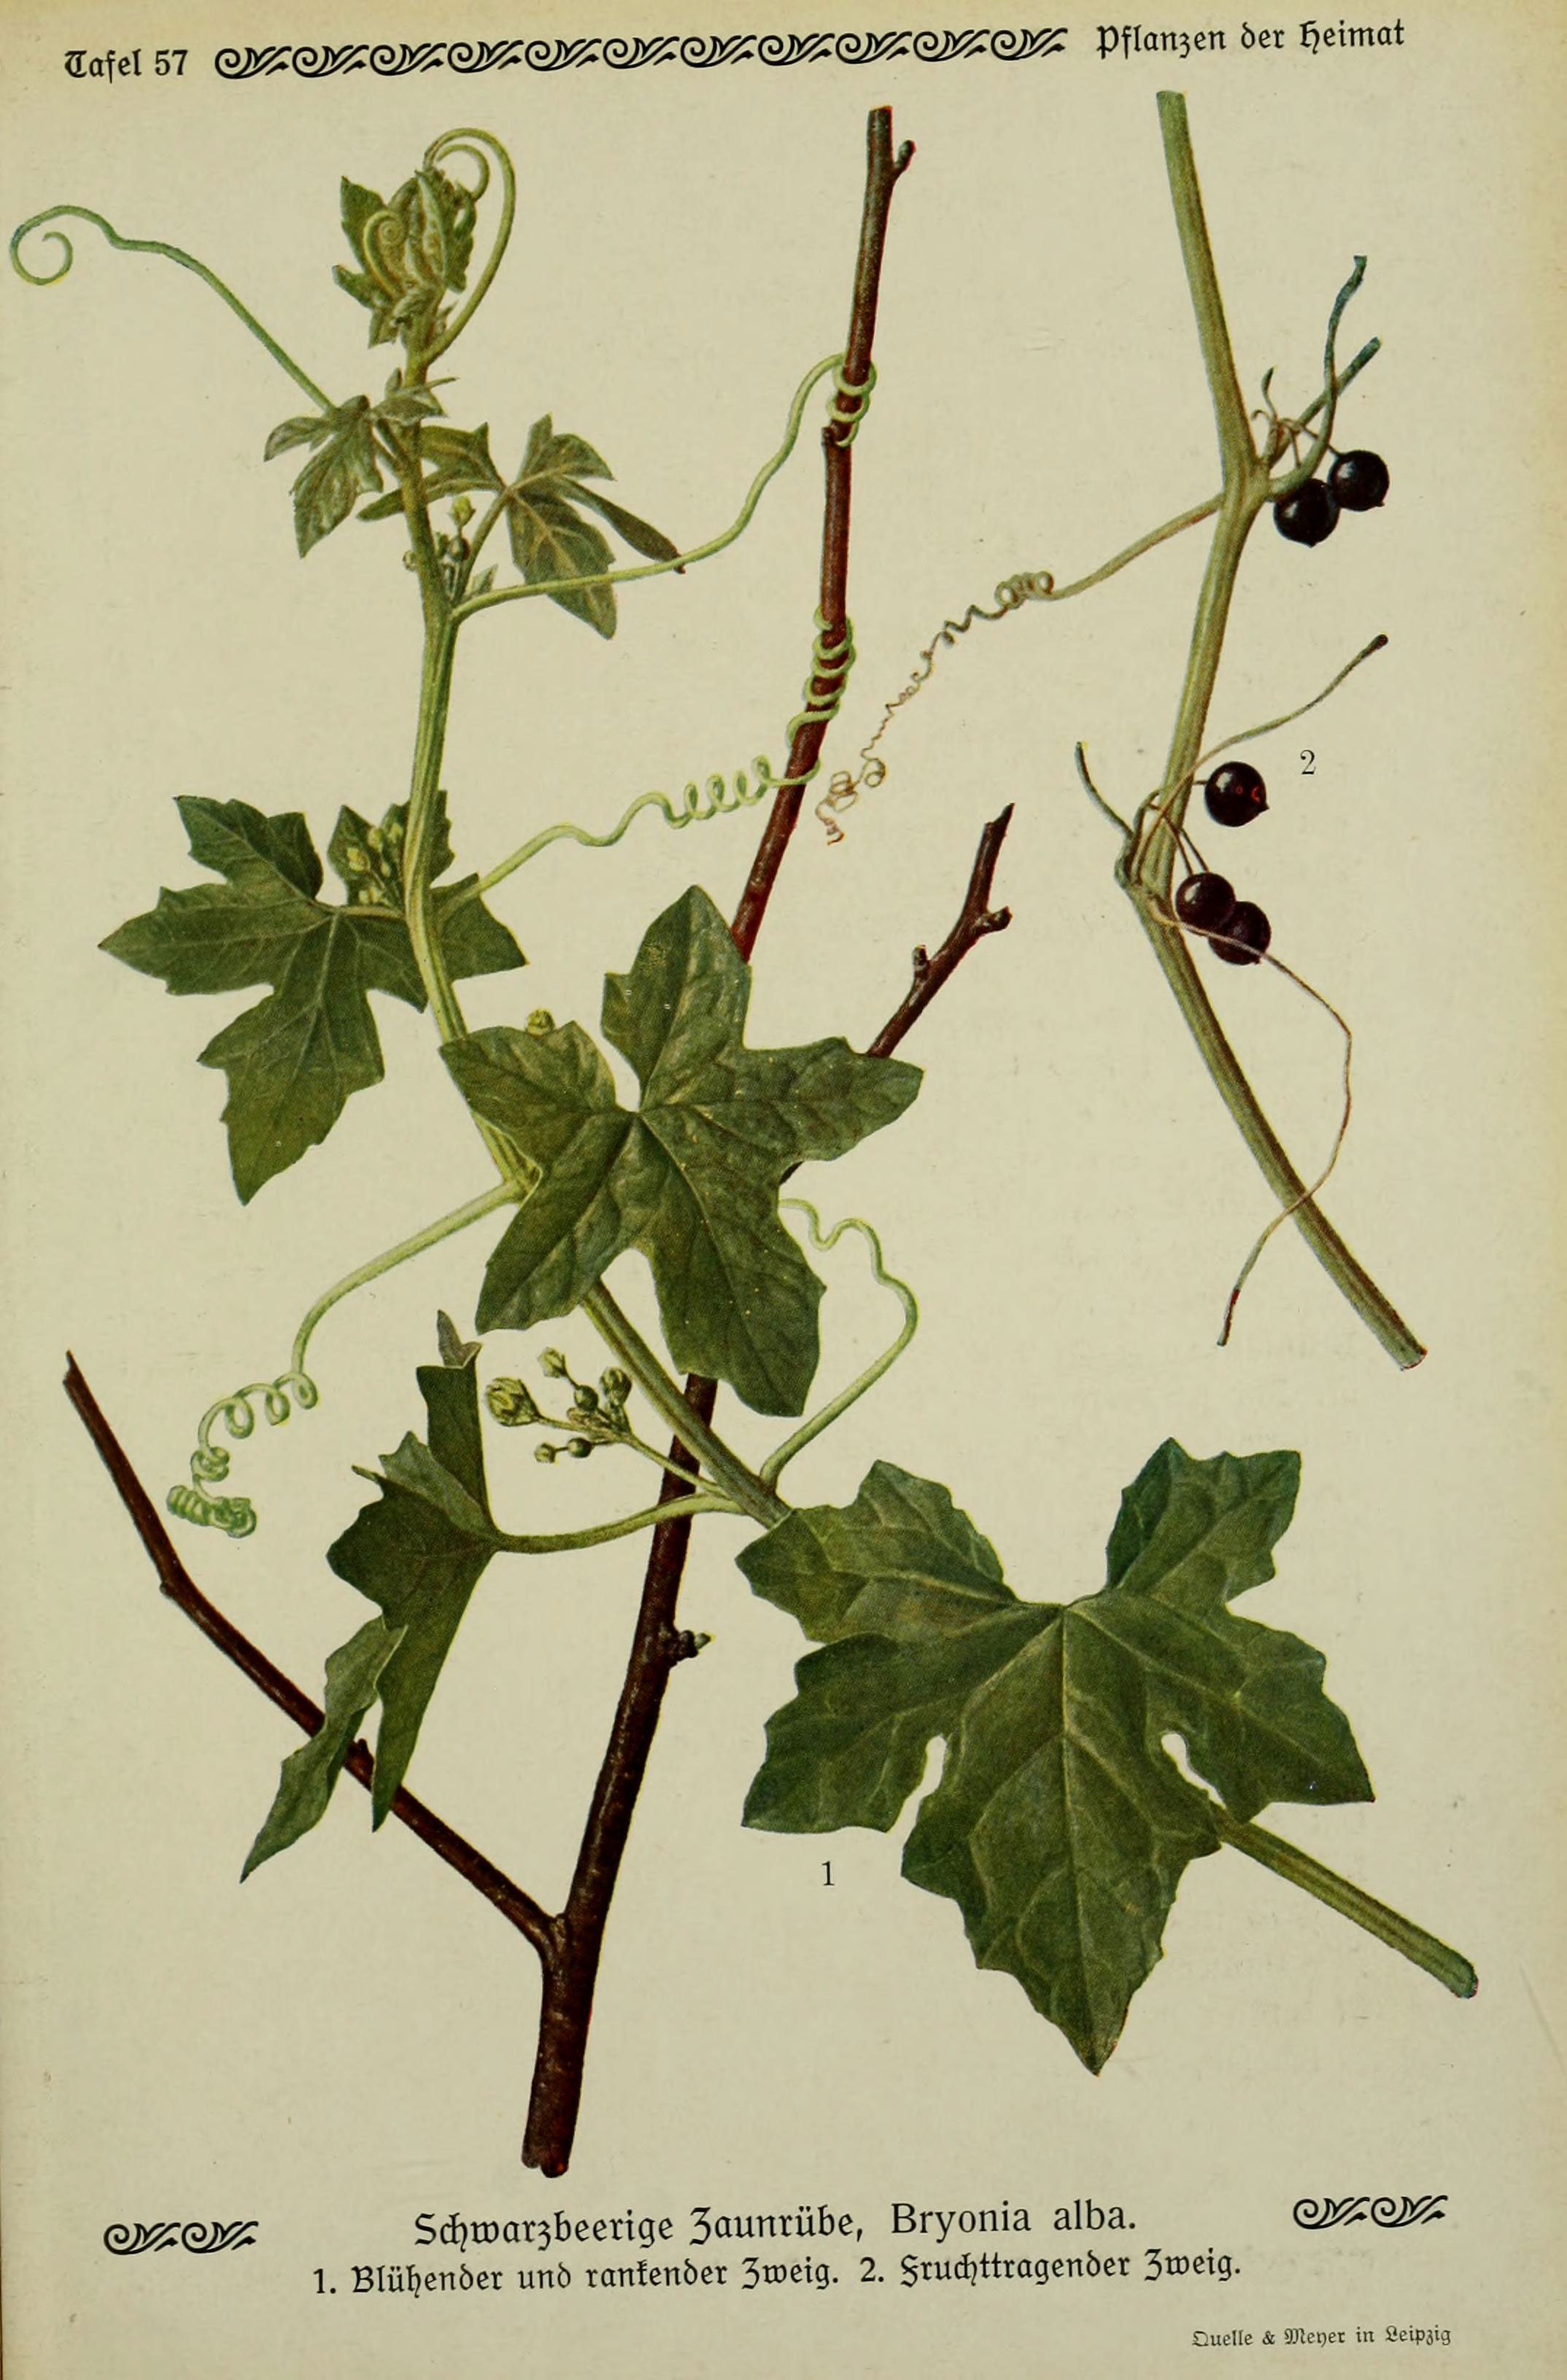 Pflanzen Im September file pflanzen der heimat tafel 57 6099929302 jpg wikimedia commons